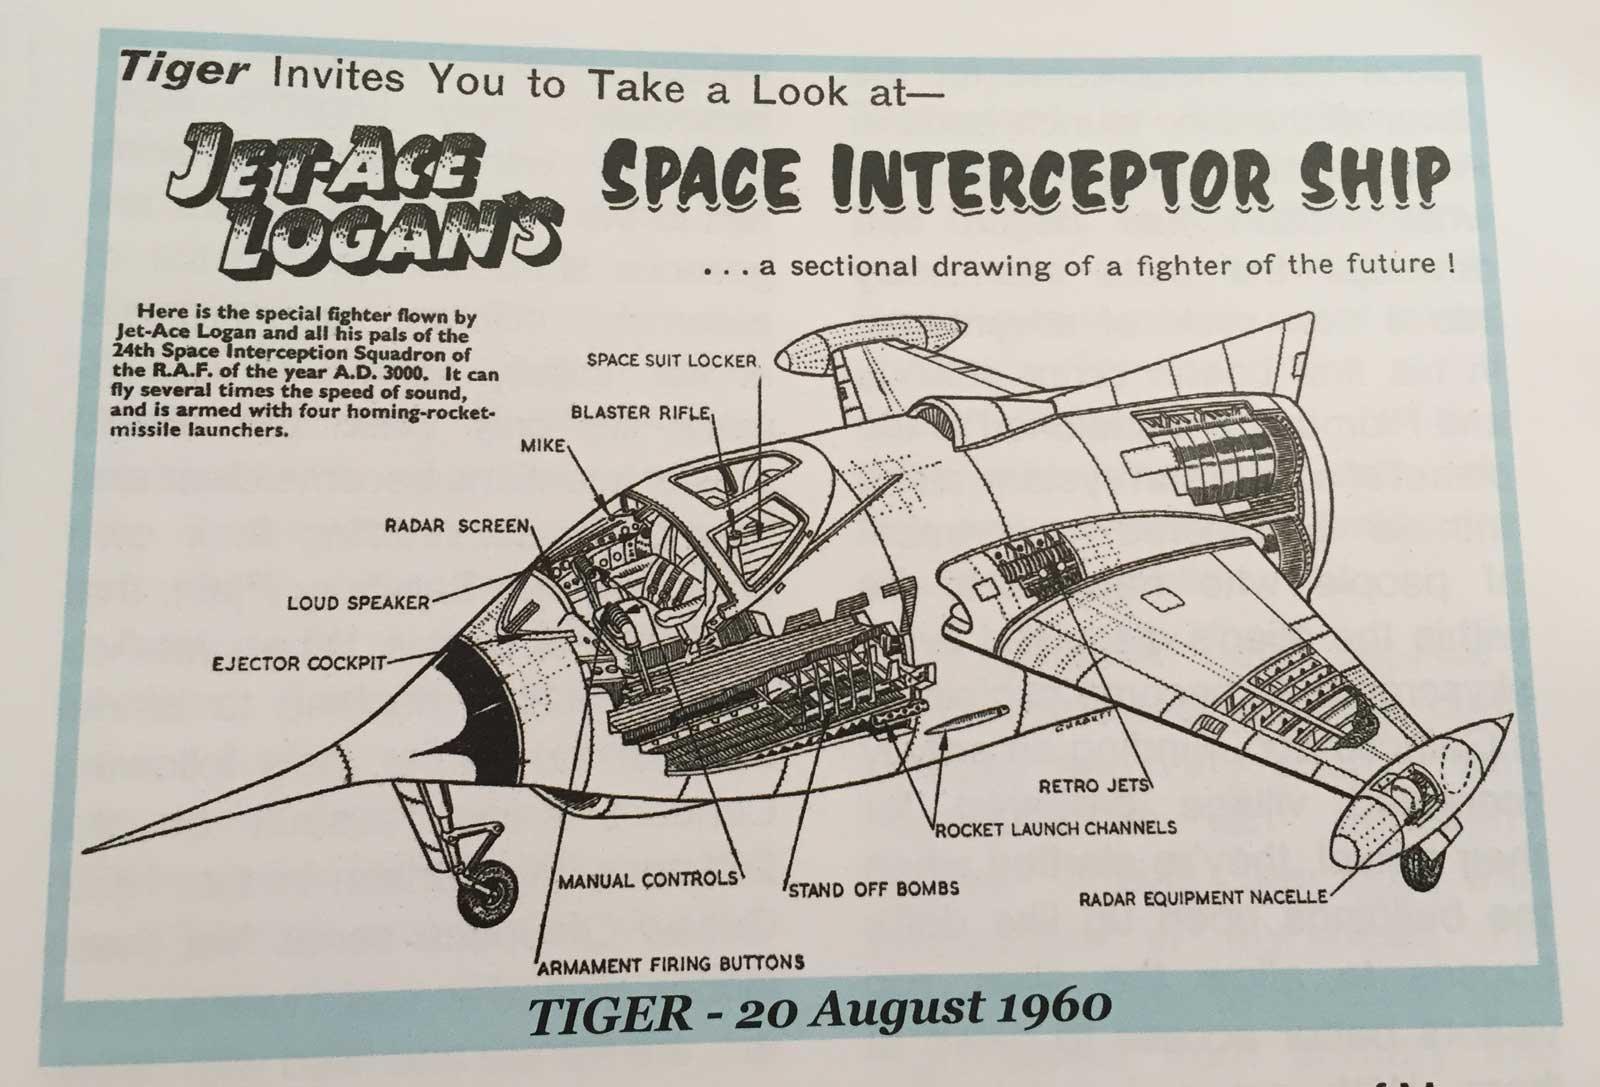 Jet Ace Logan Interceptor. Art © TimeUK